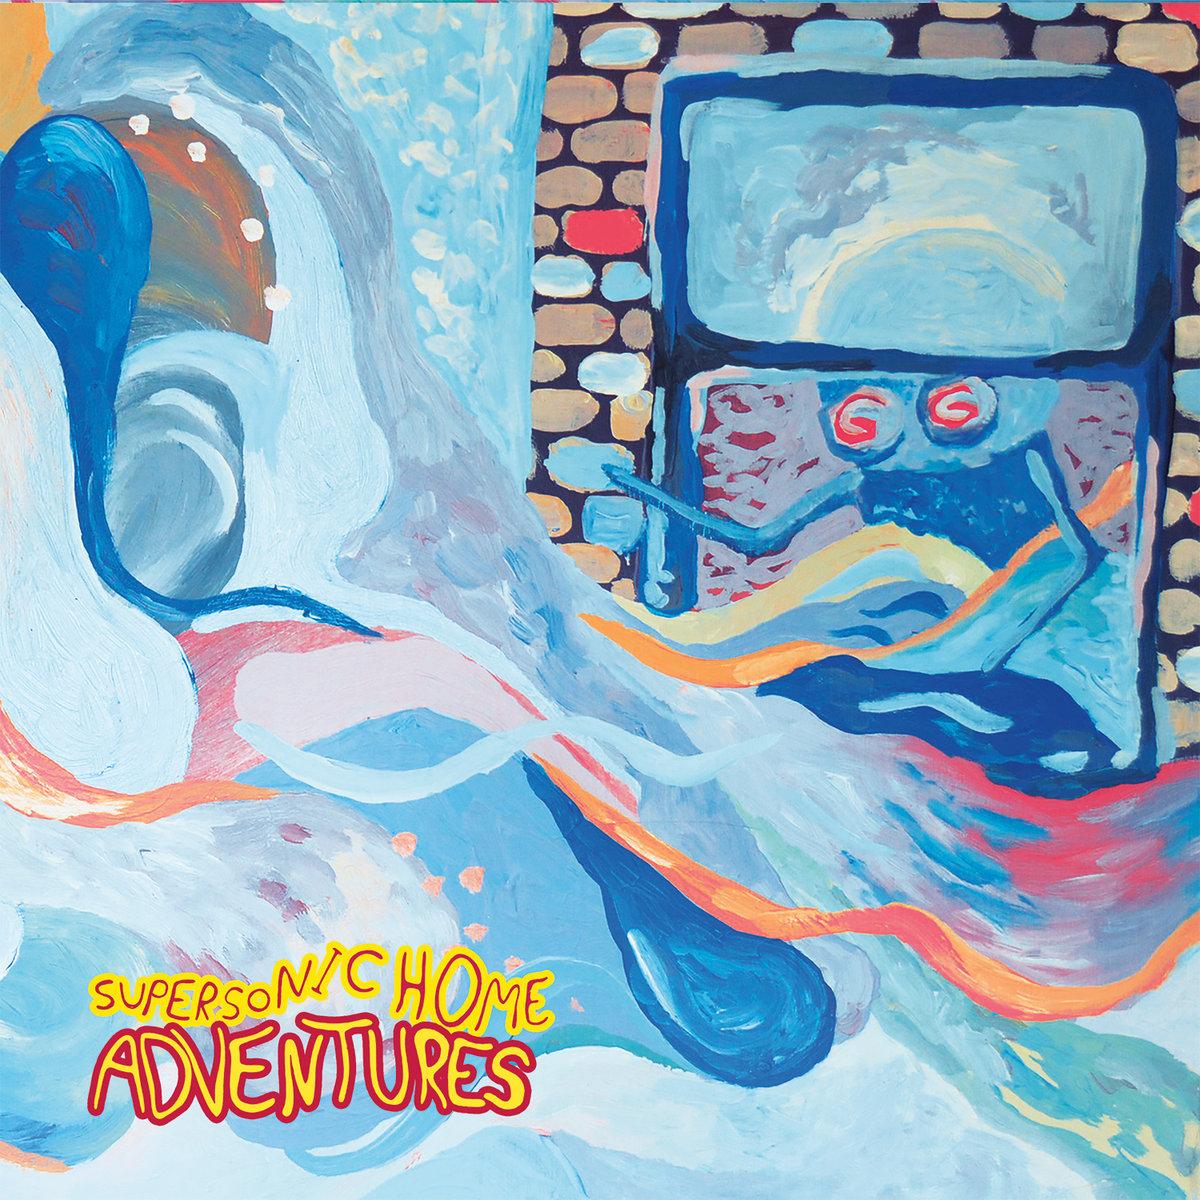 Adventures -